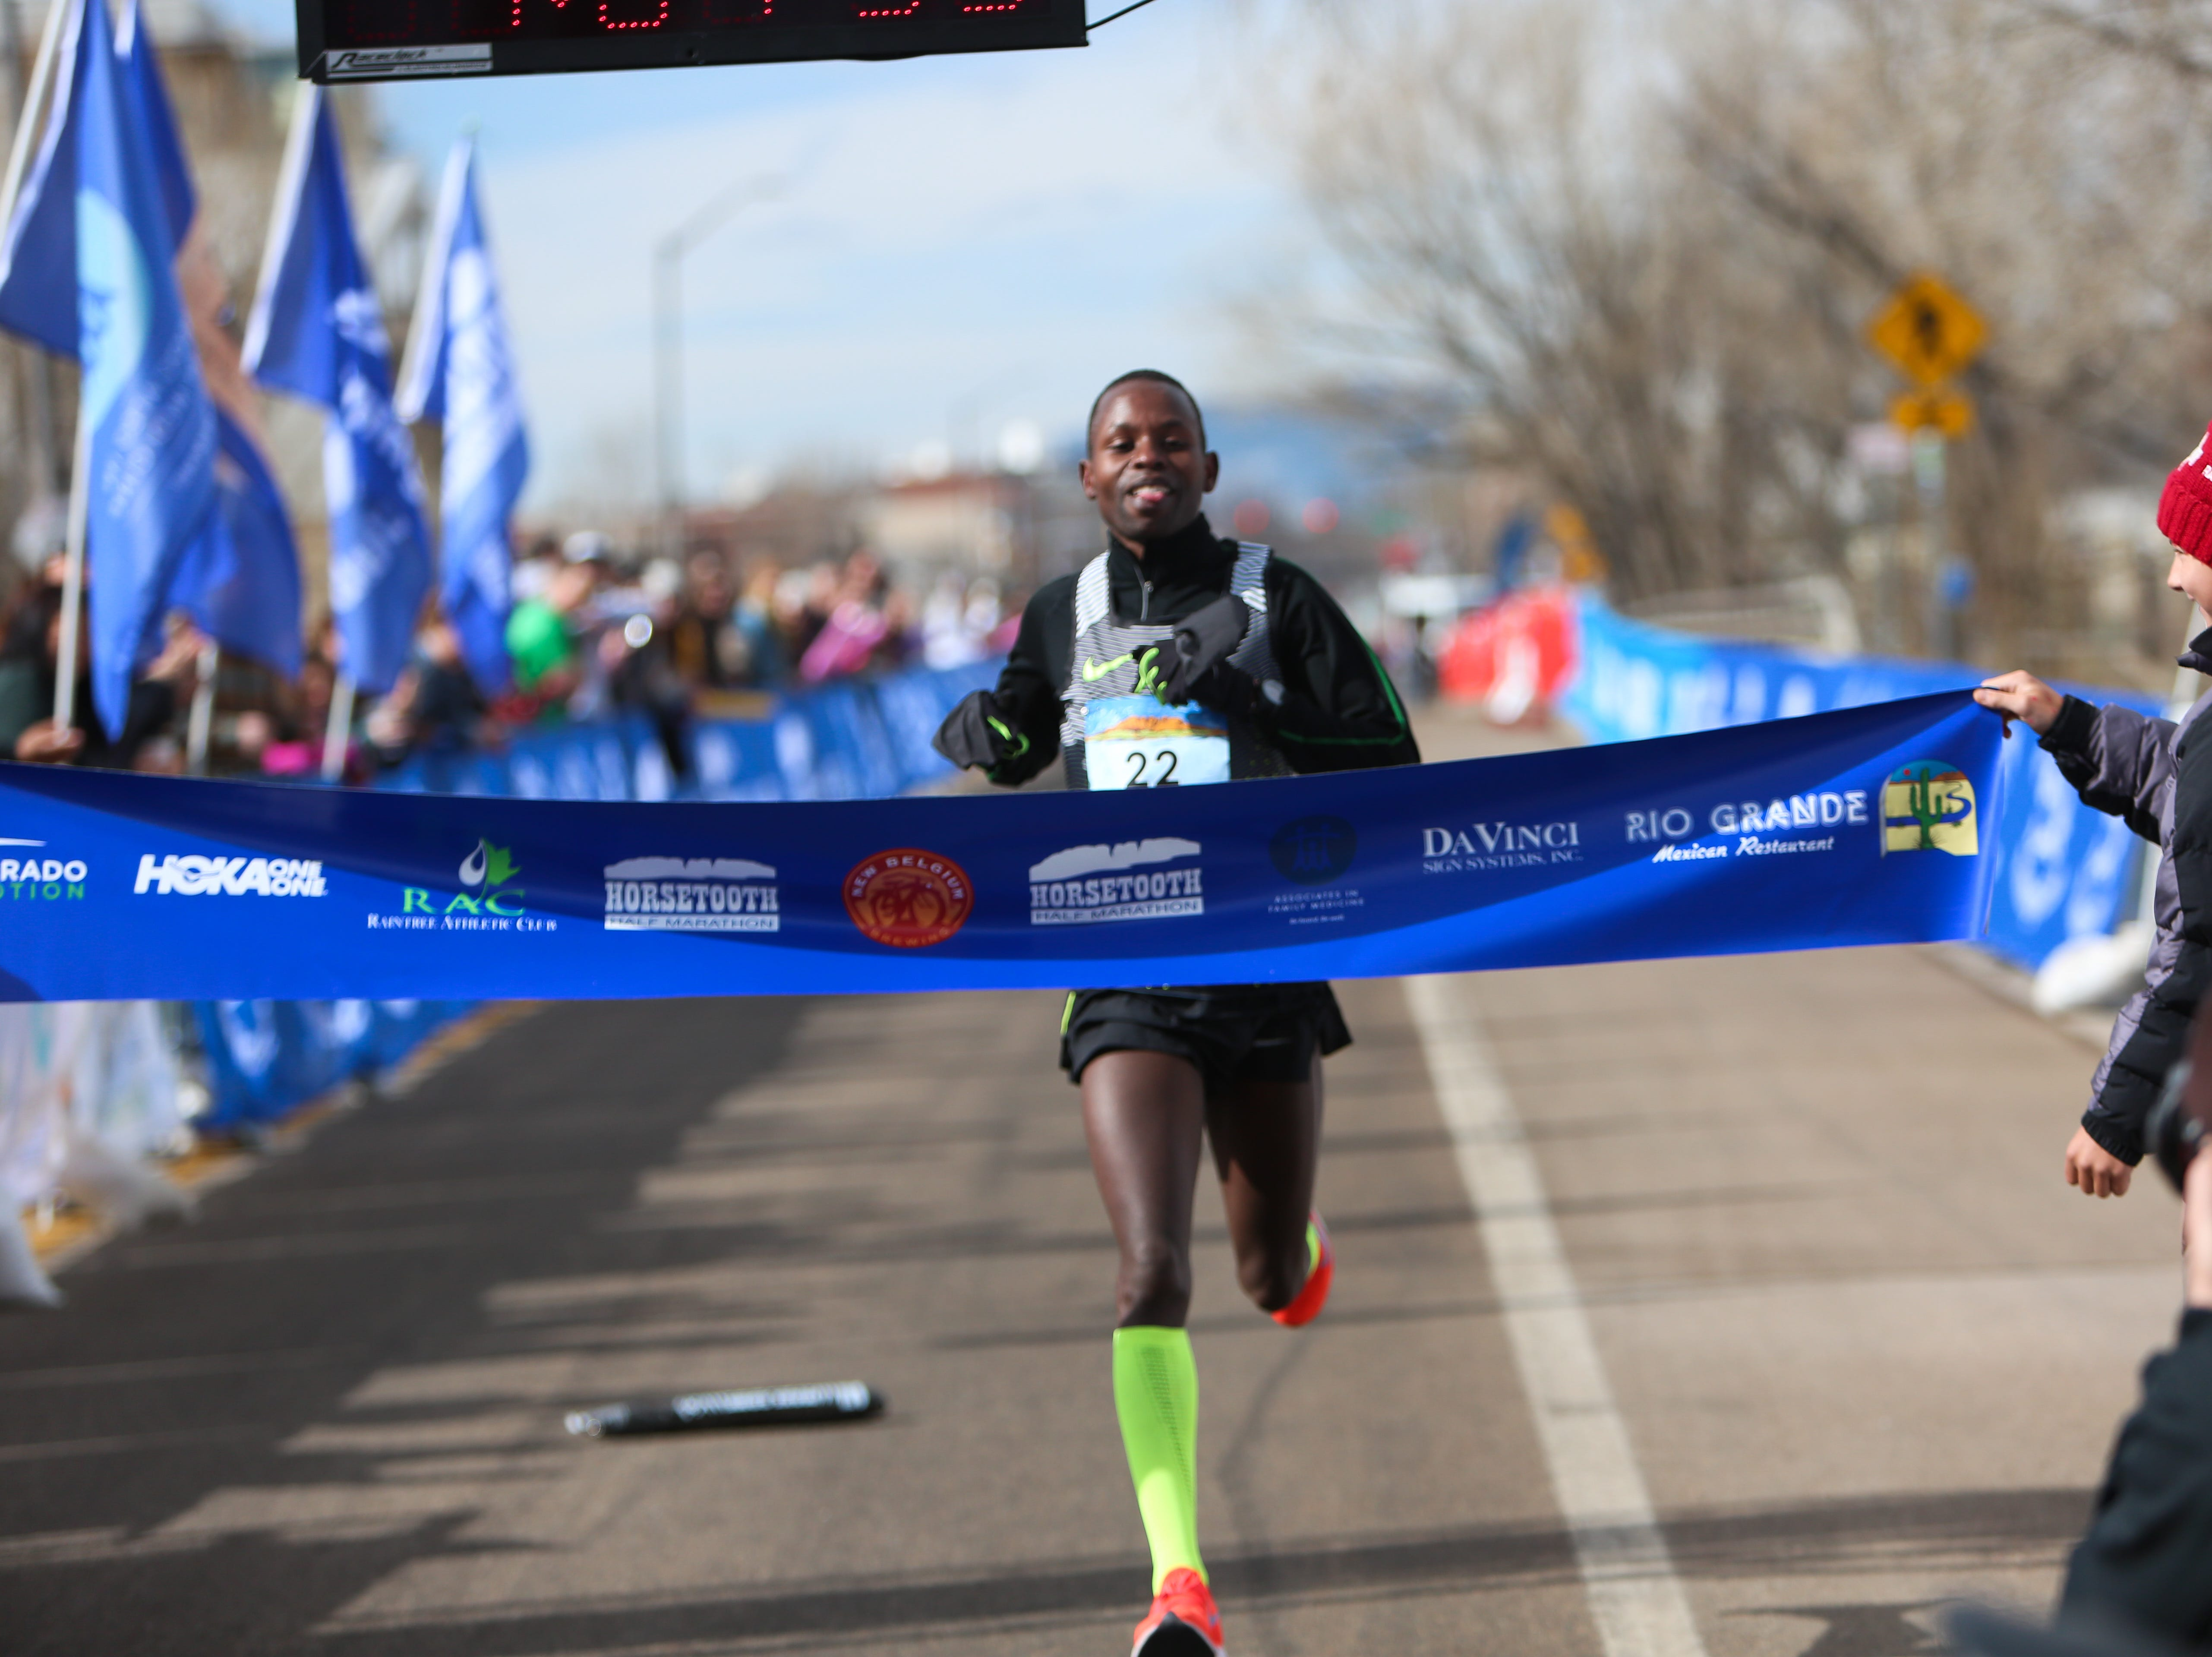 completes the Horsetooth Half Marathon on April 14.